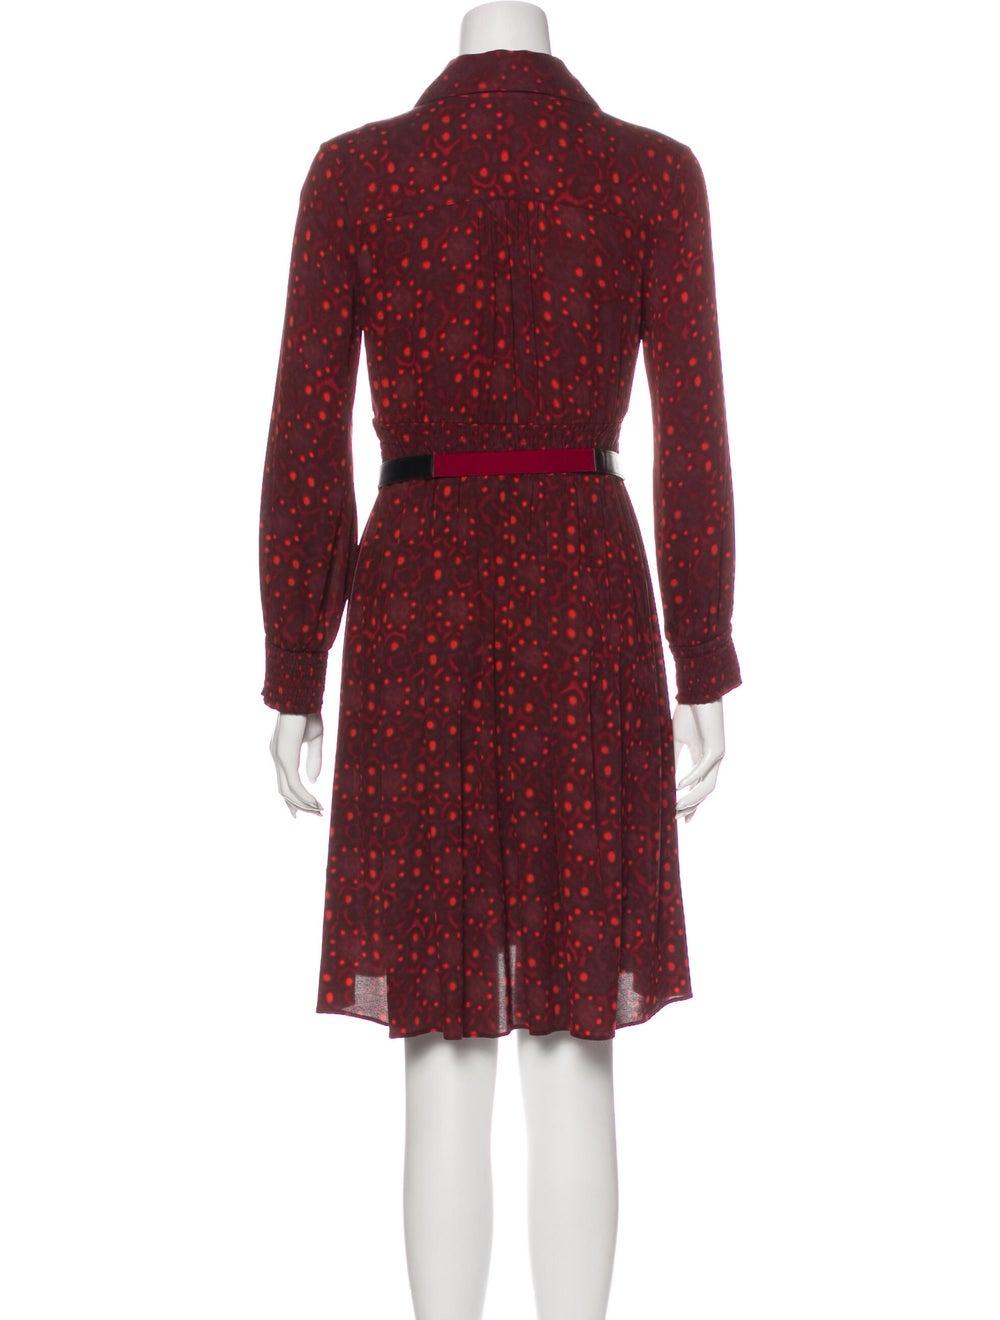 Alice + Olivia Silk Knee-Length Dress - image 3